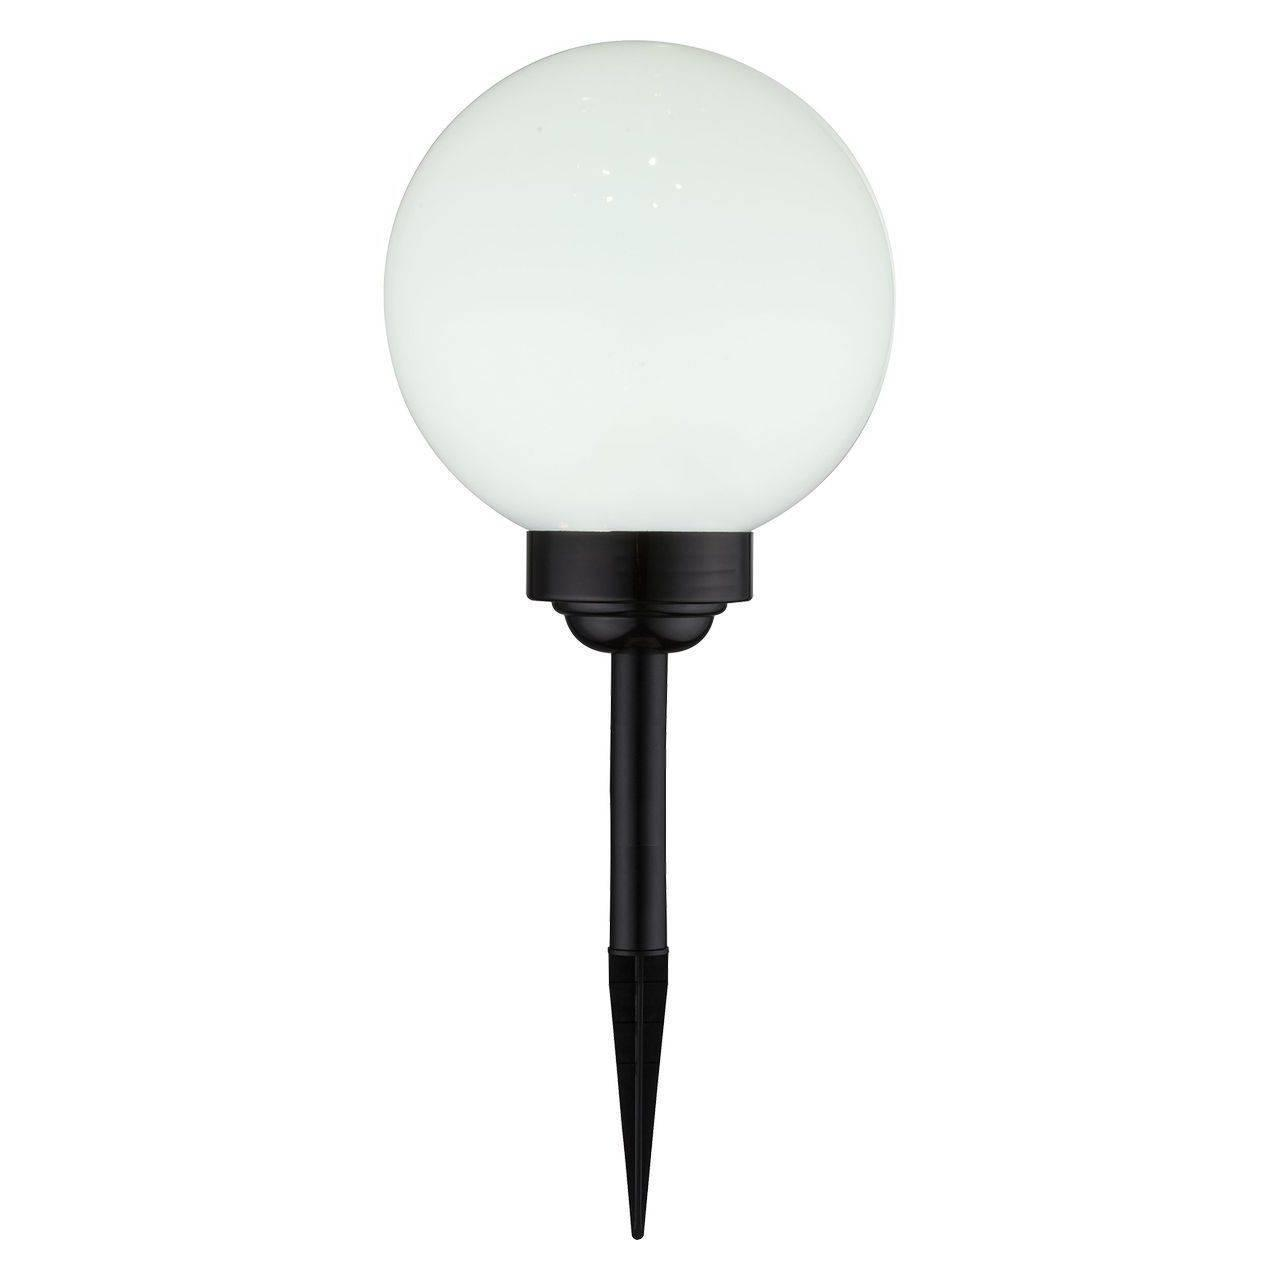 Ландшафтный светодиодный светильник Globo 31793 ландшафтный светодиодный светильник globo meriton 32000